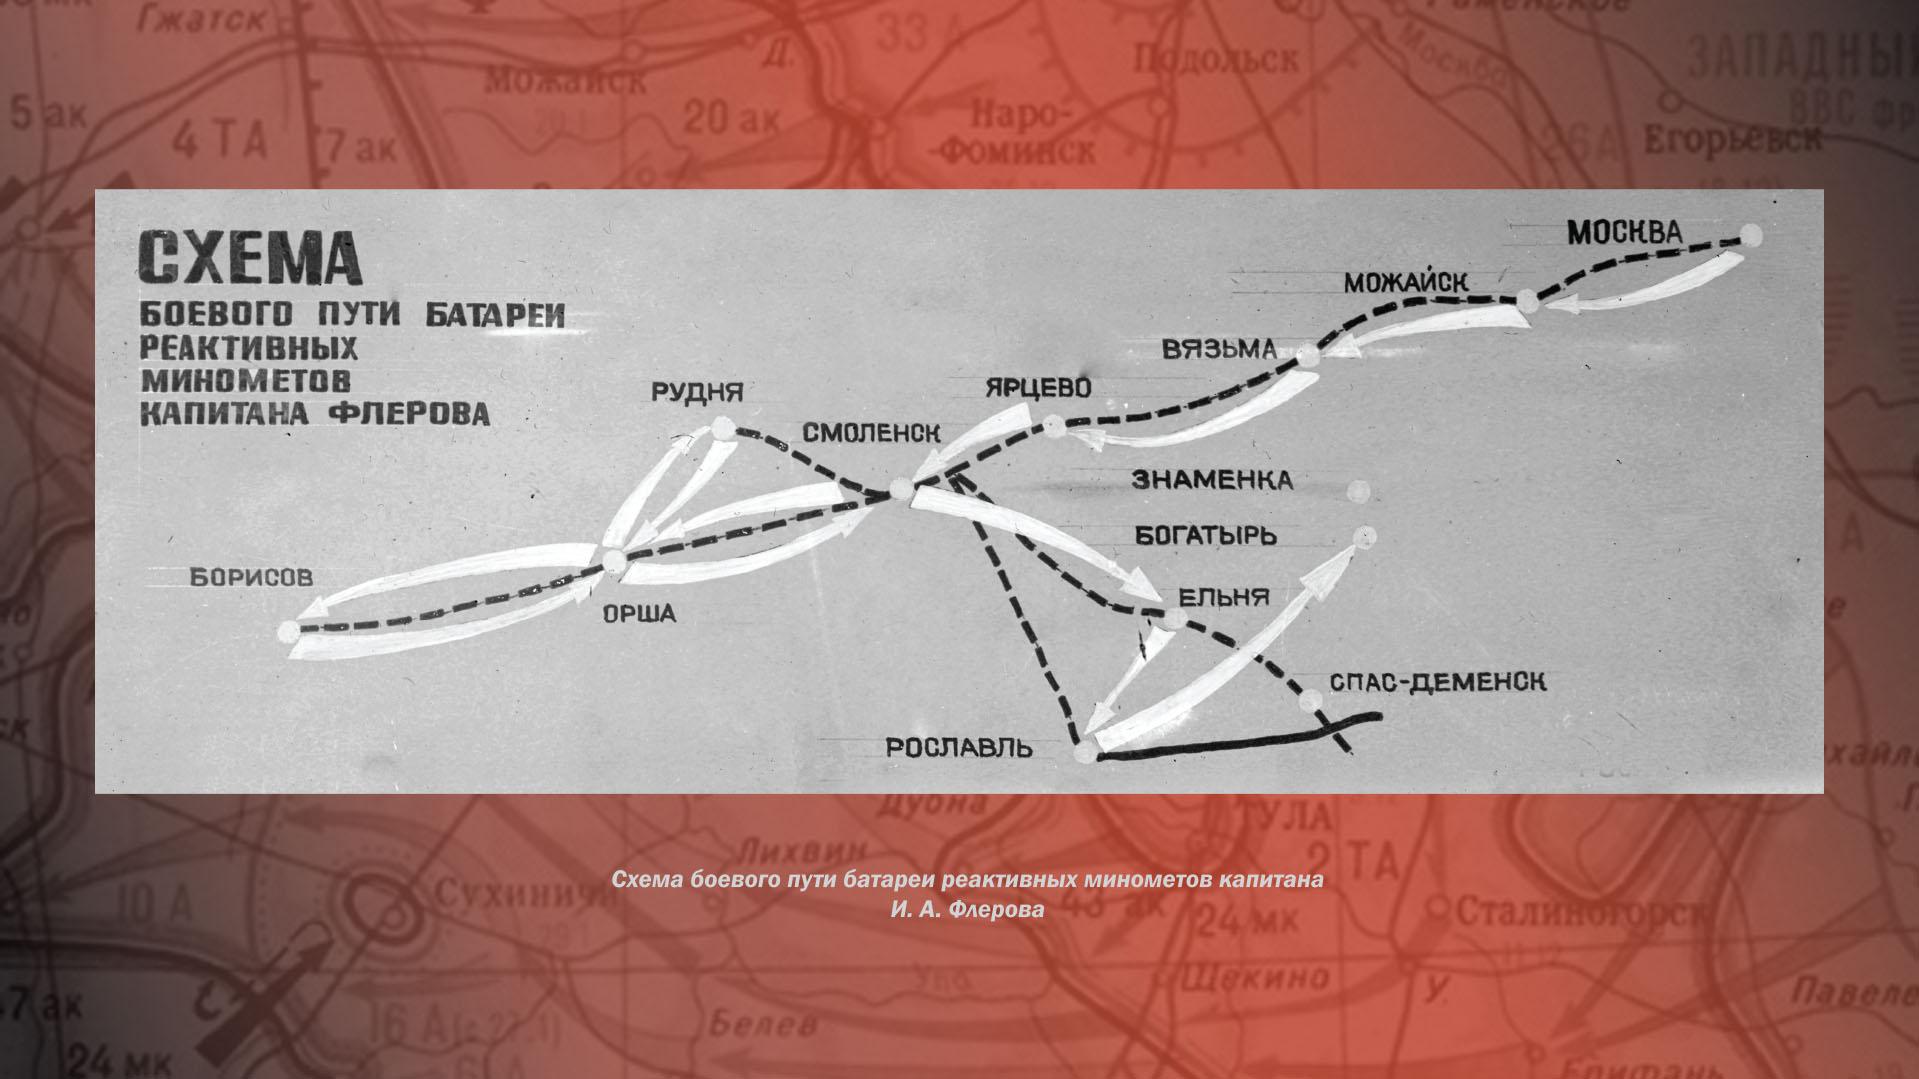 Схема боевого пути батареи реактивных минометов  капитана И.А. Флерова